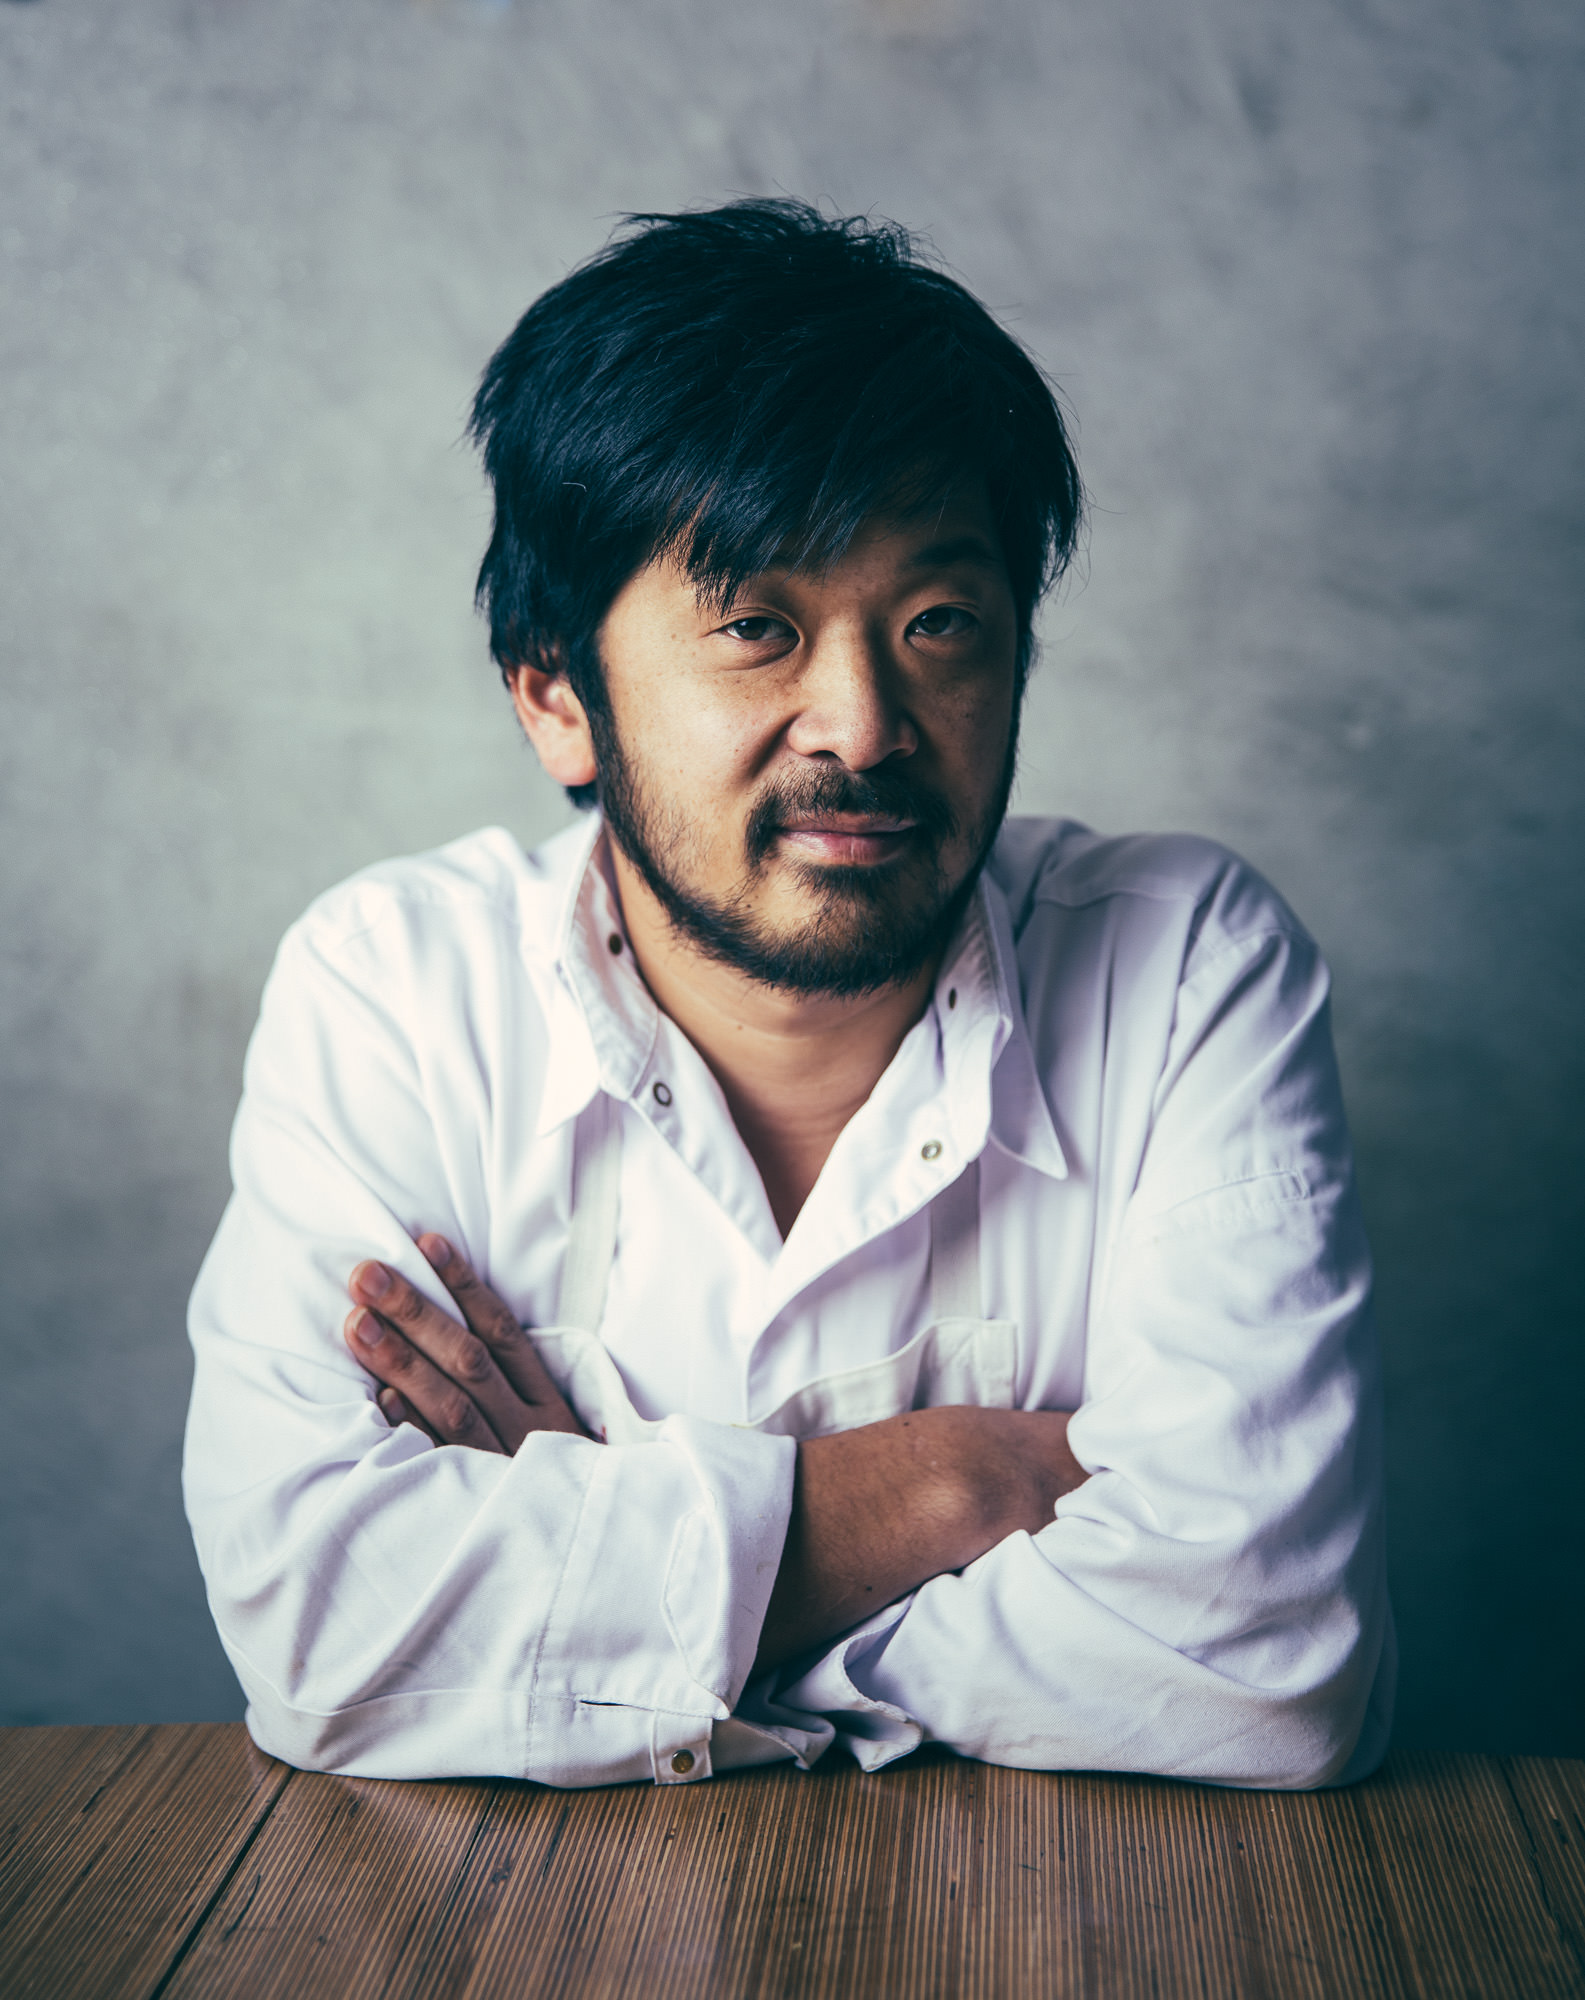 Keisuke010